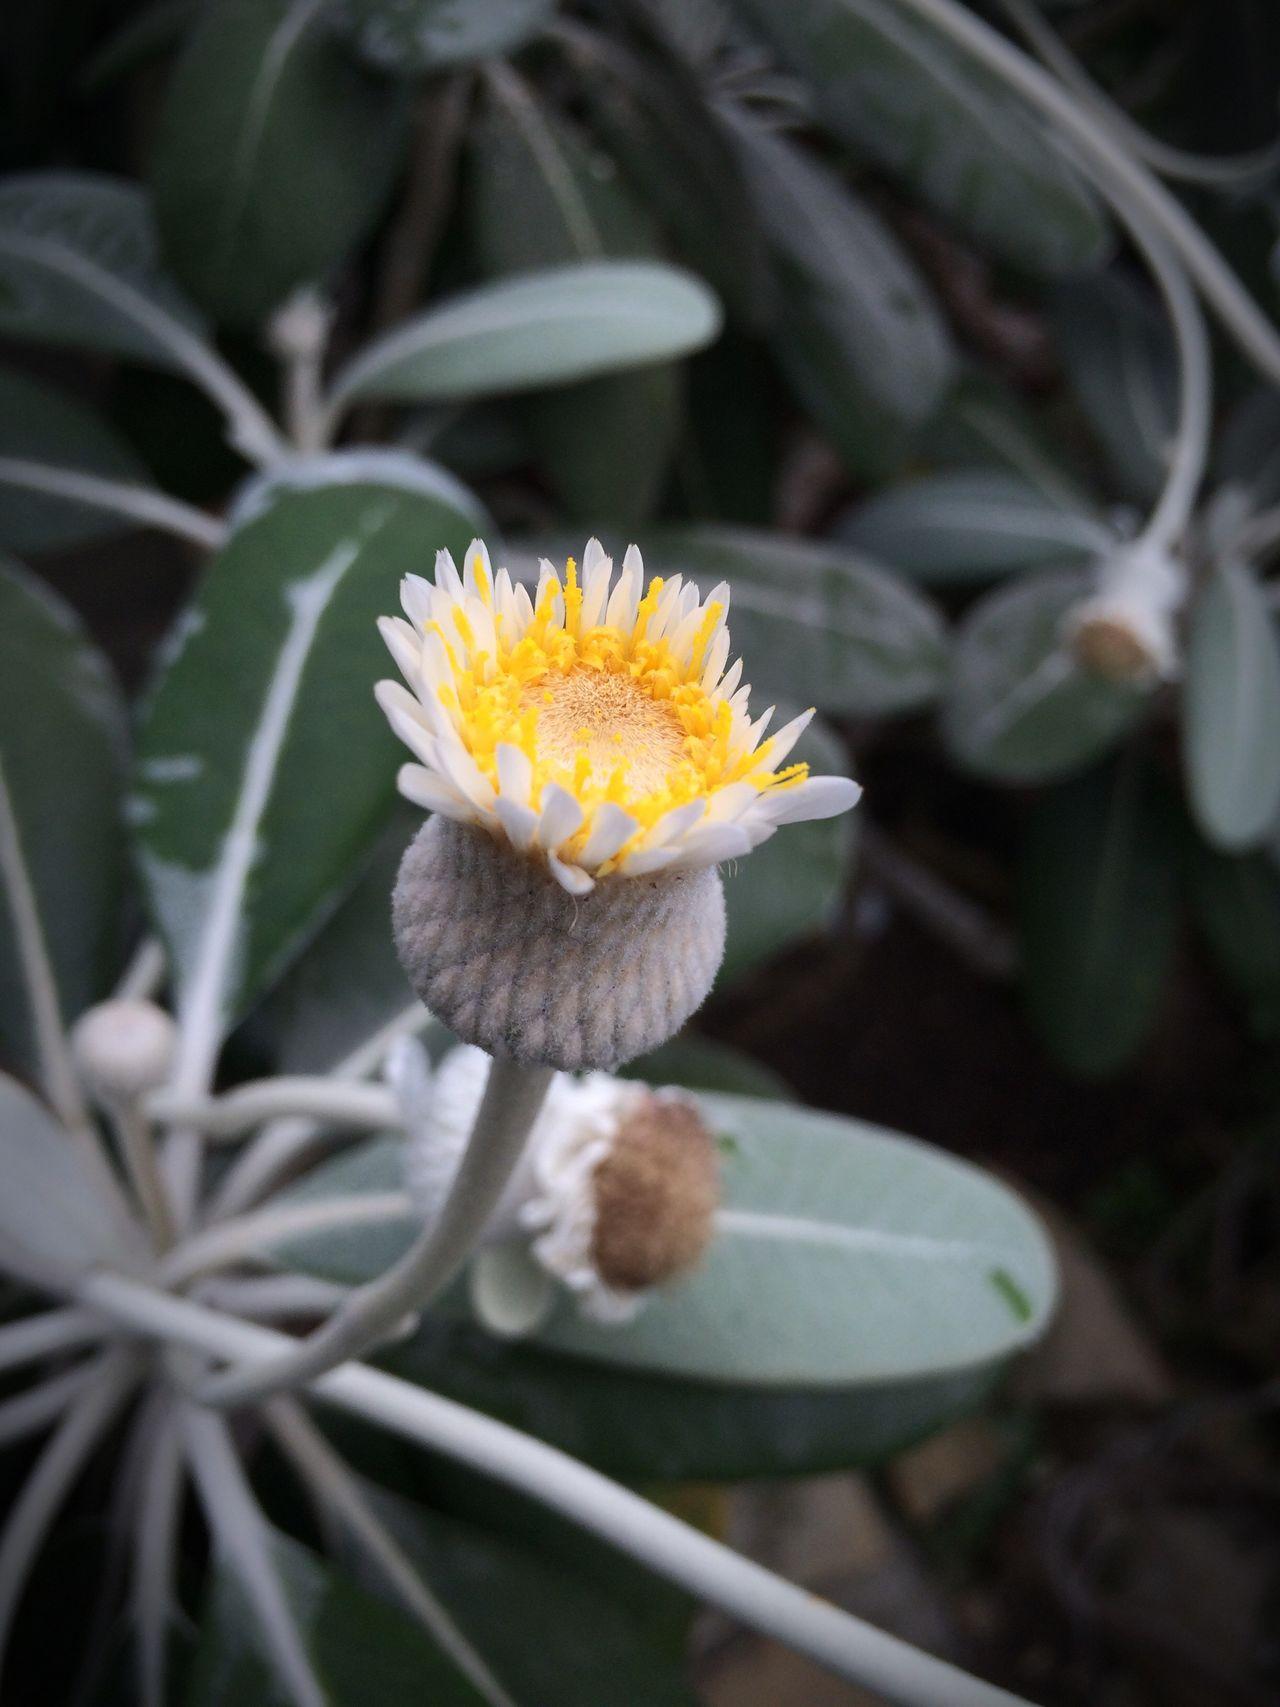 Flower Blossom Plant Nature Blooming Flower